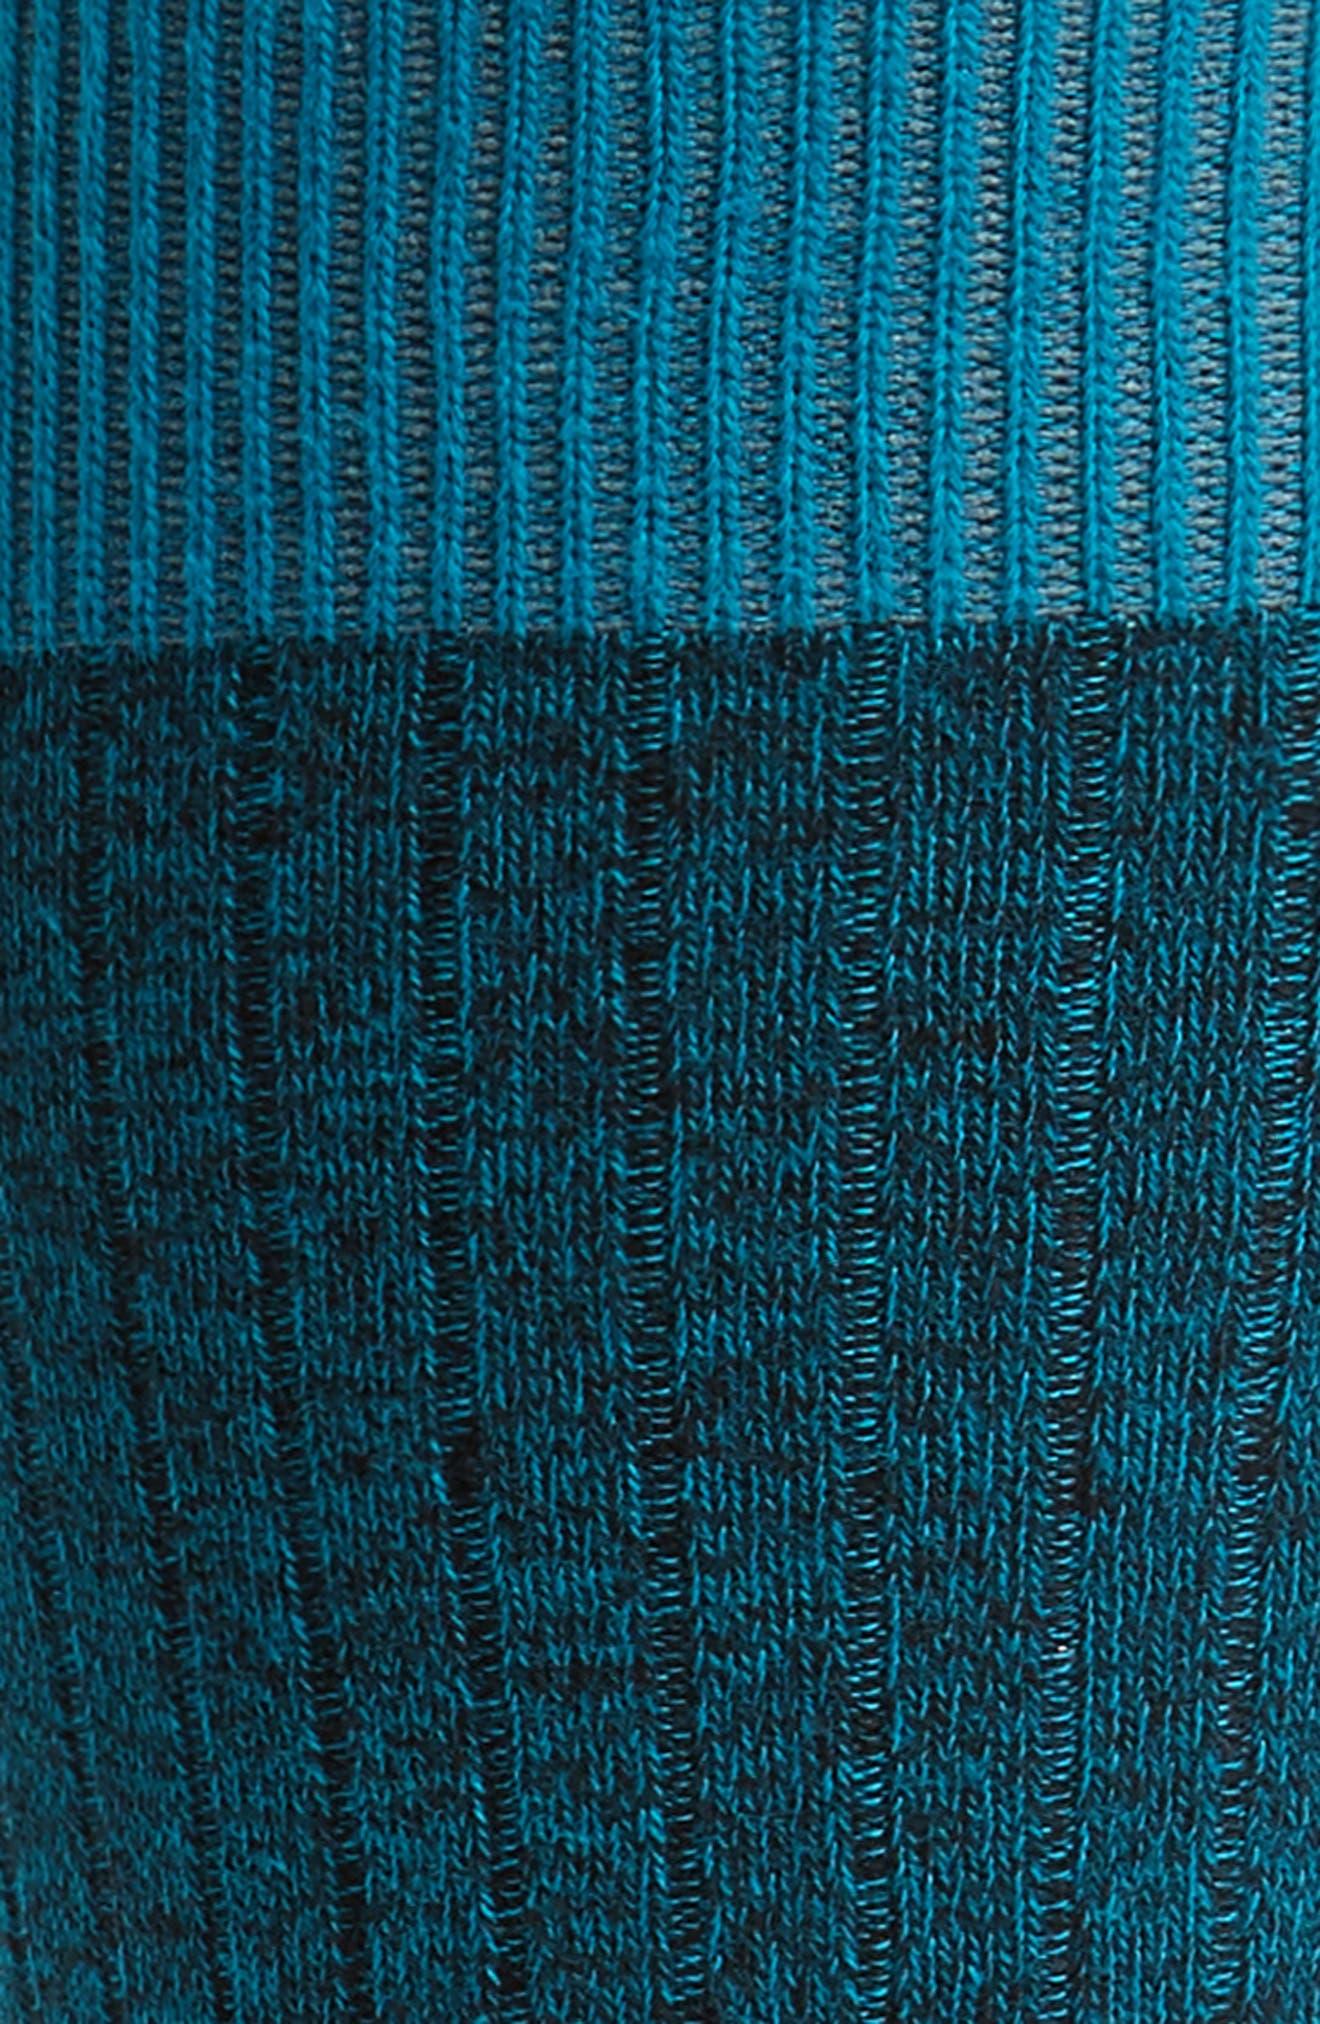 Polbray Ribbed Socks,                             Alternate thumbnail 2, color,                             Teal